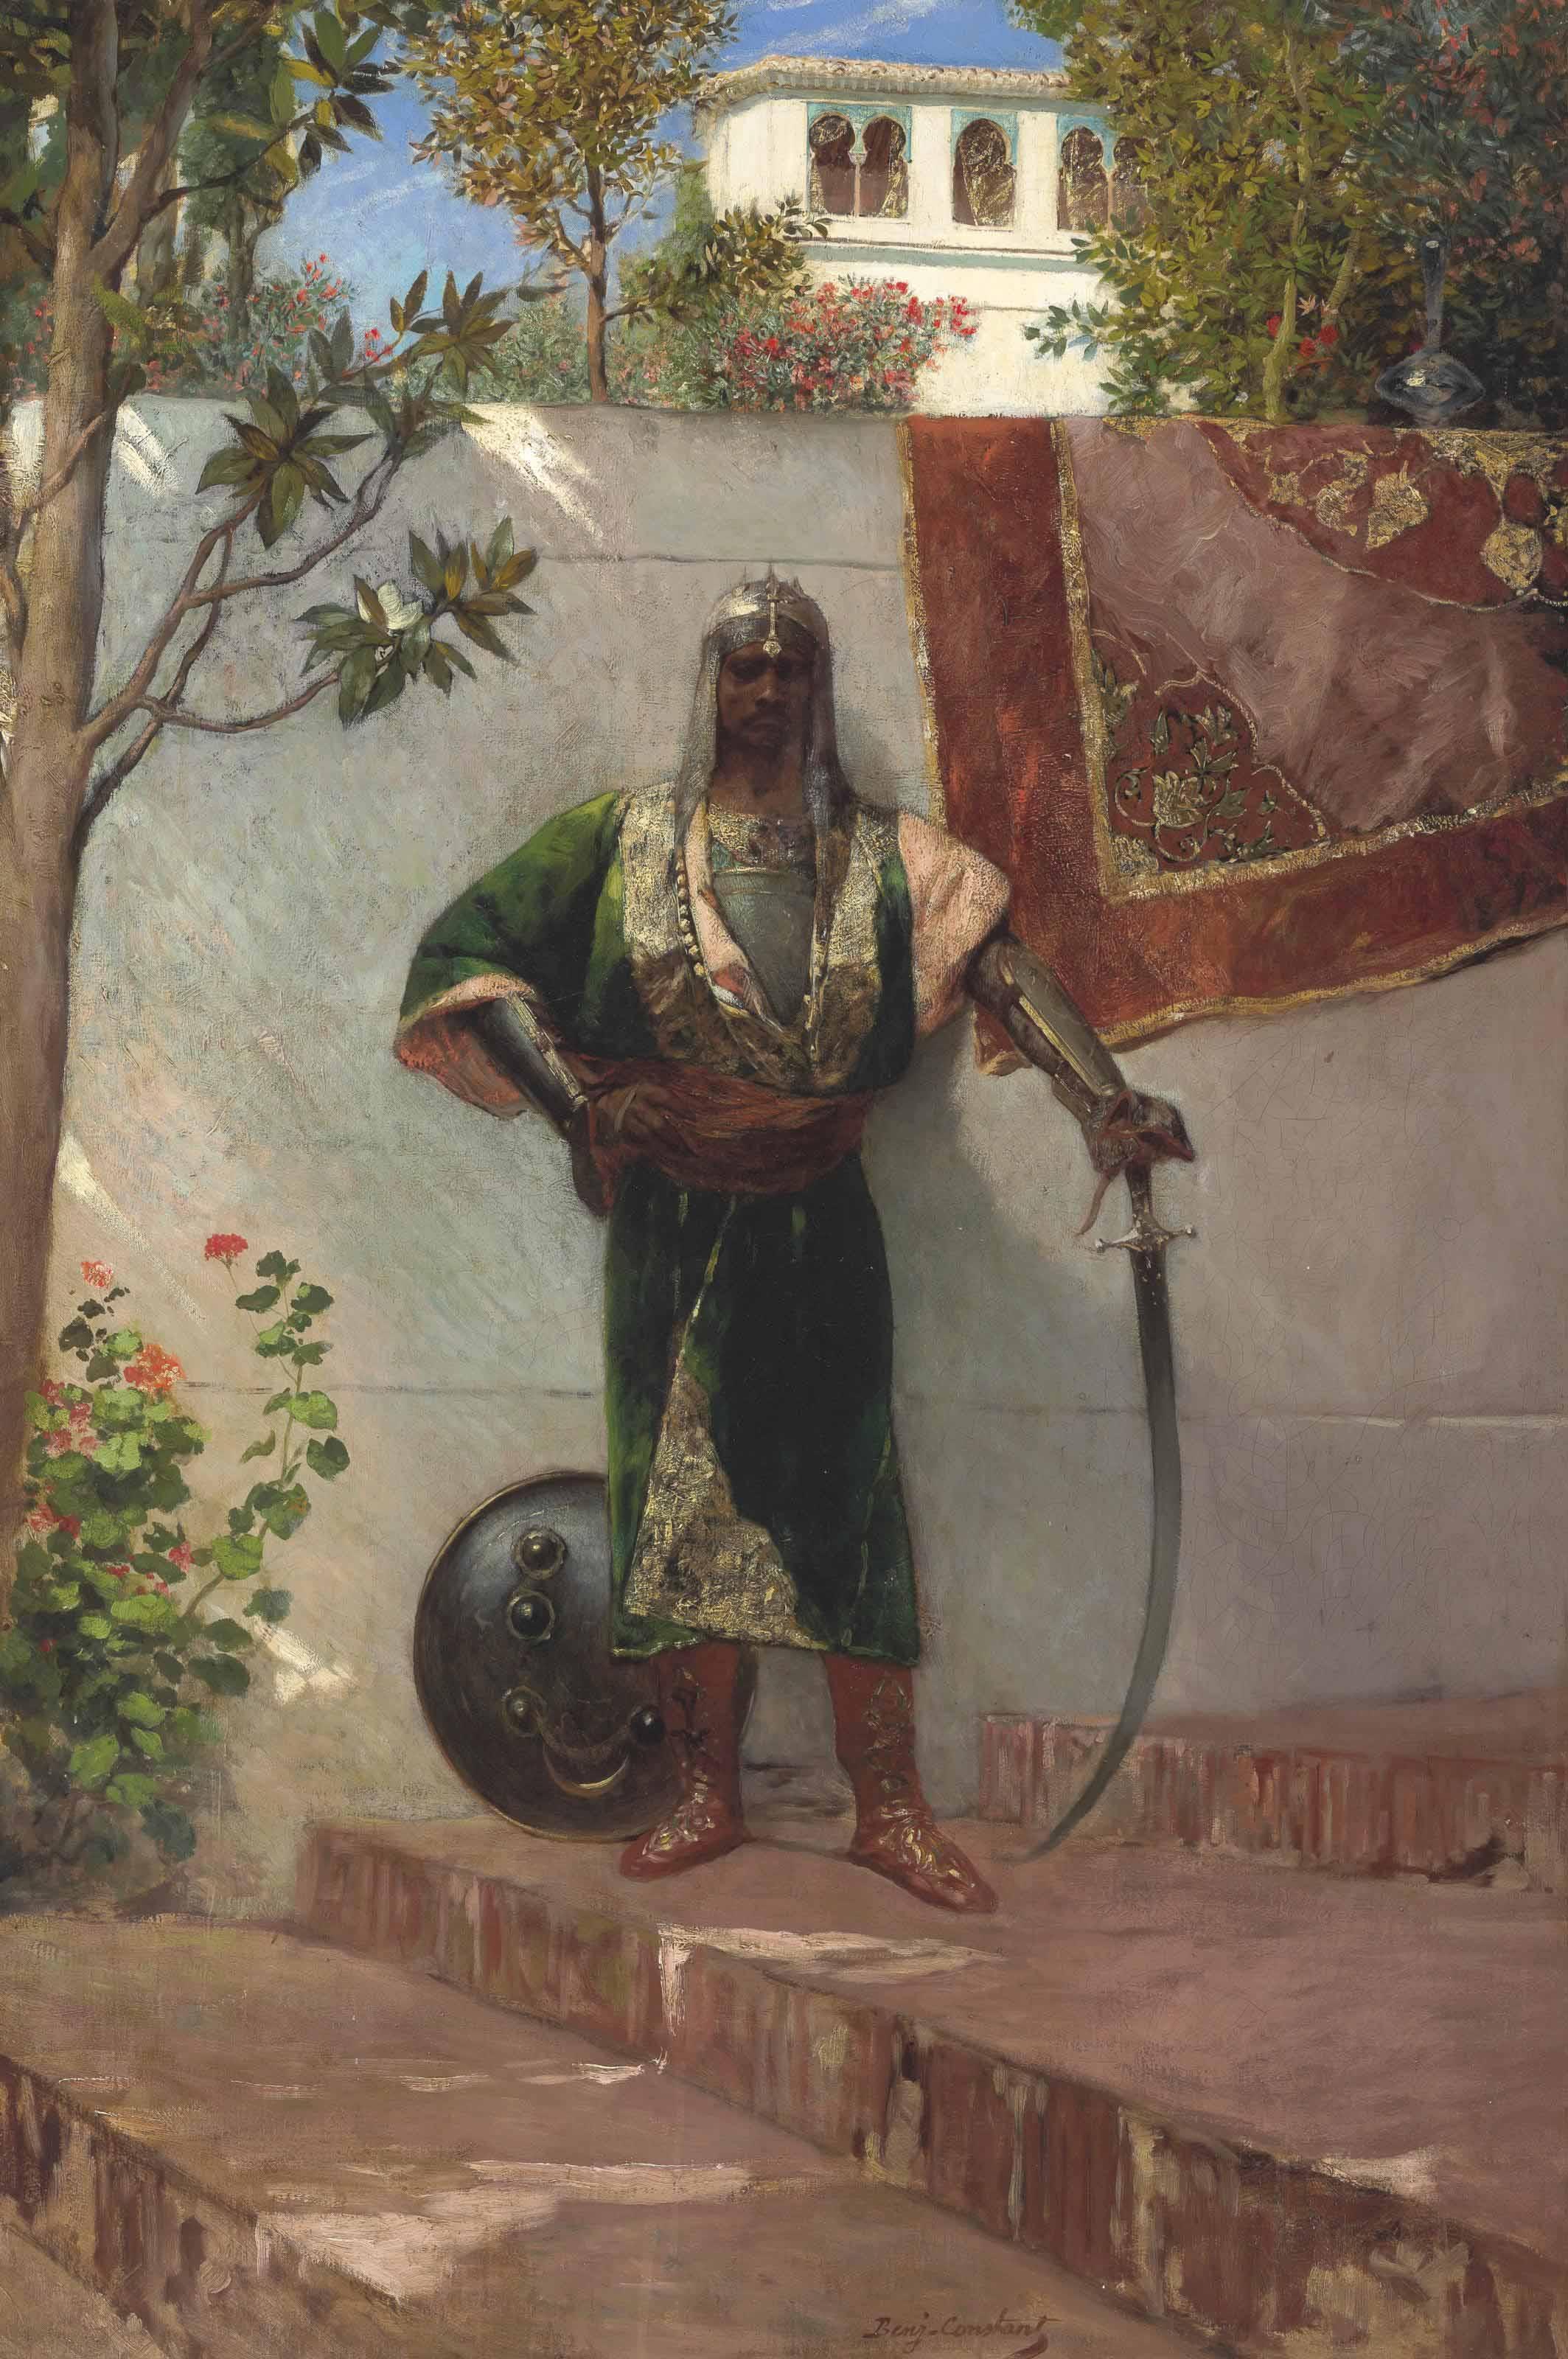 A Janissary